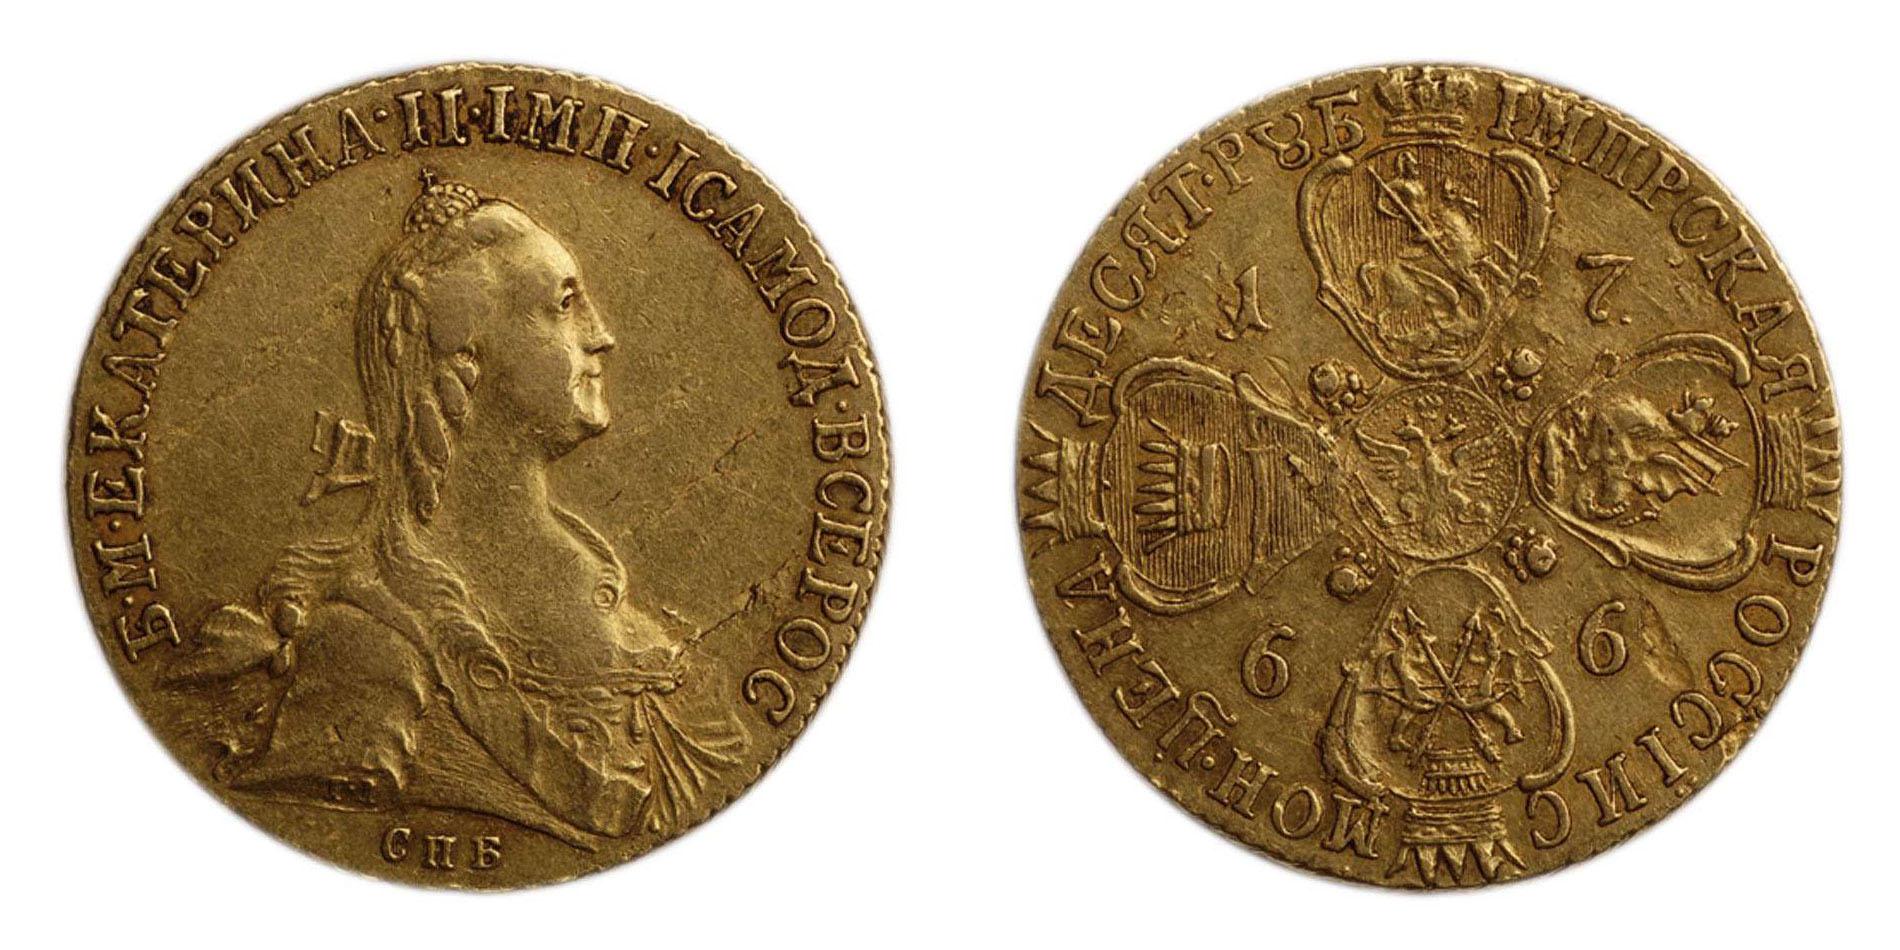 Драма, каска с монетами царь шоколад Плющенко рассказал